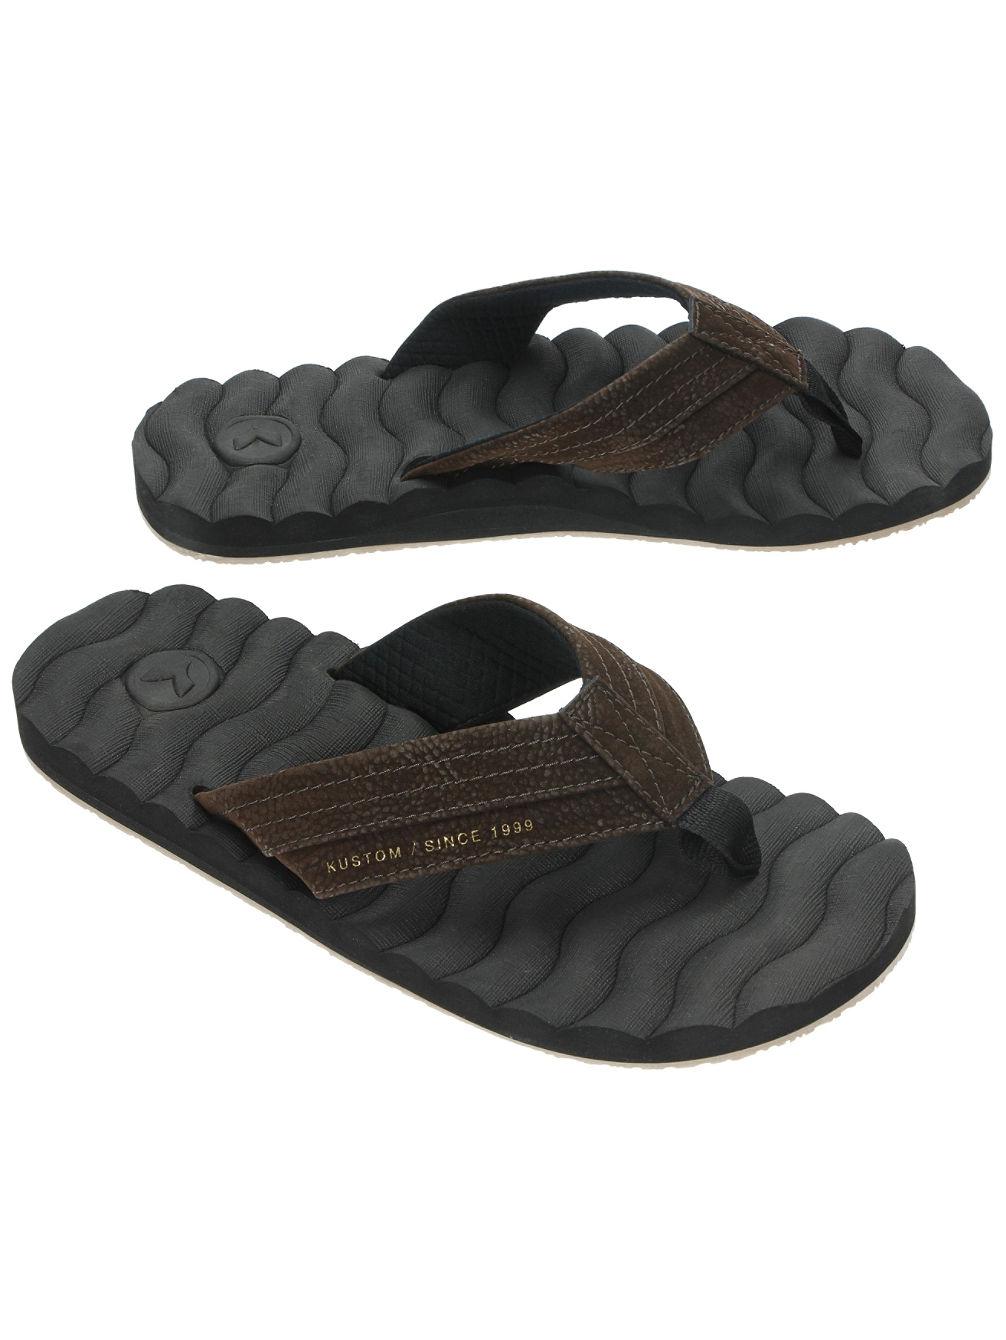 e53b50c2b Buy Kustom Hummer DLX Sandals online at Blue Tomato